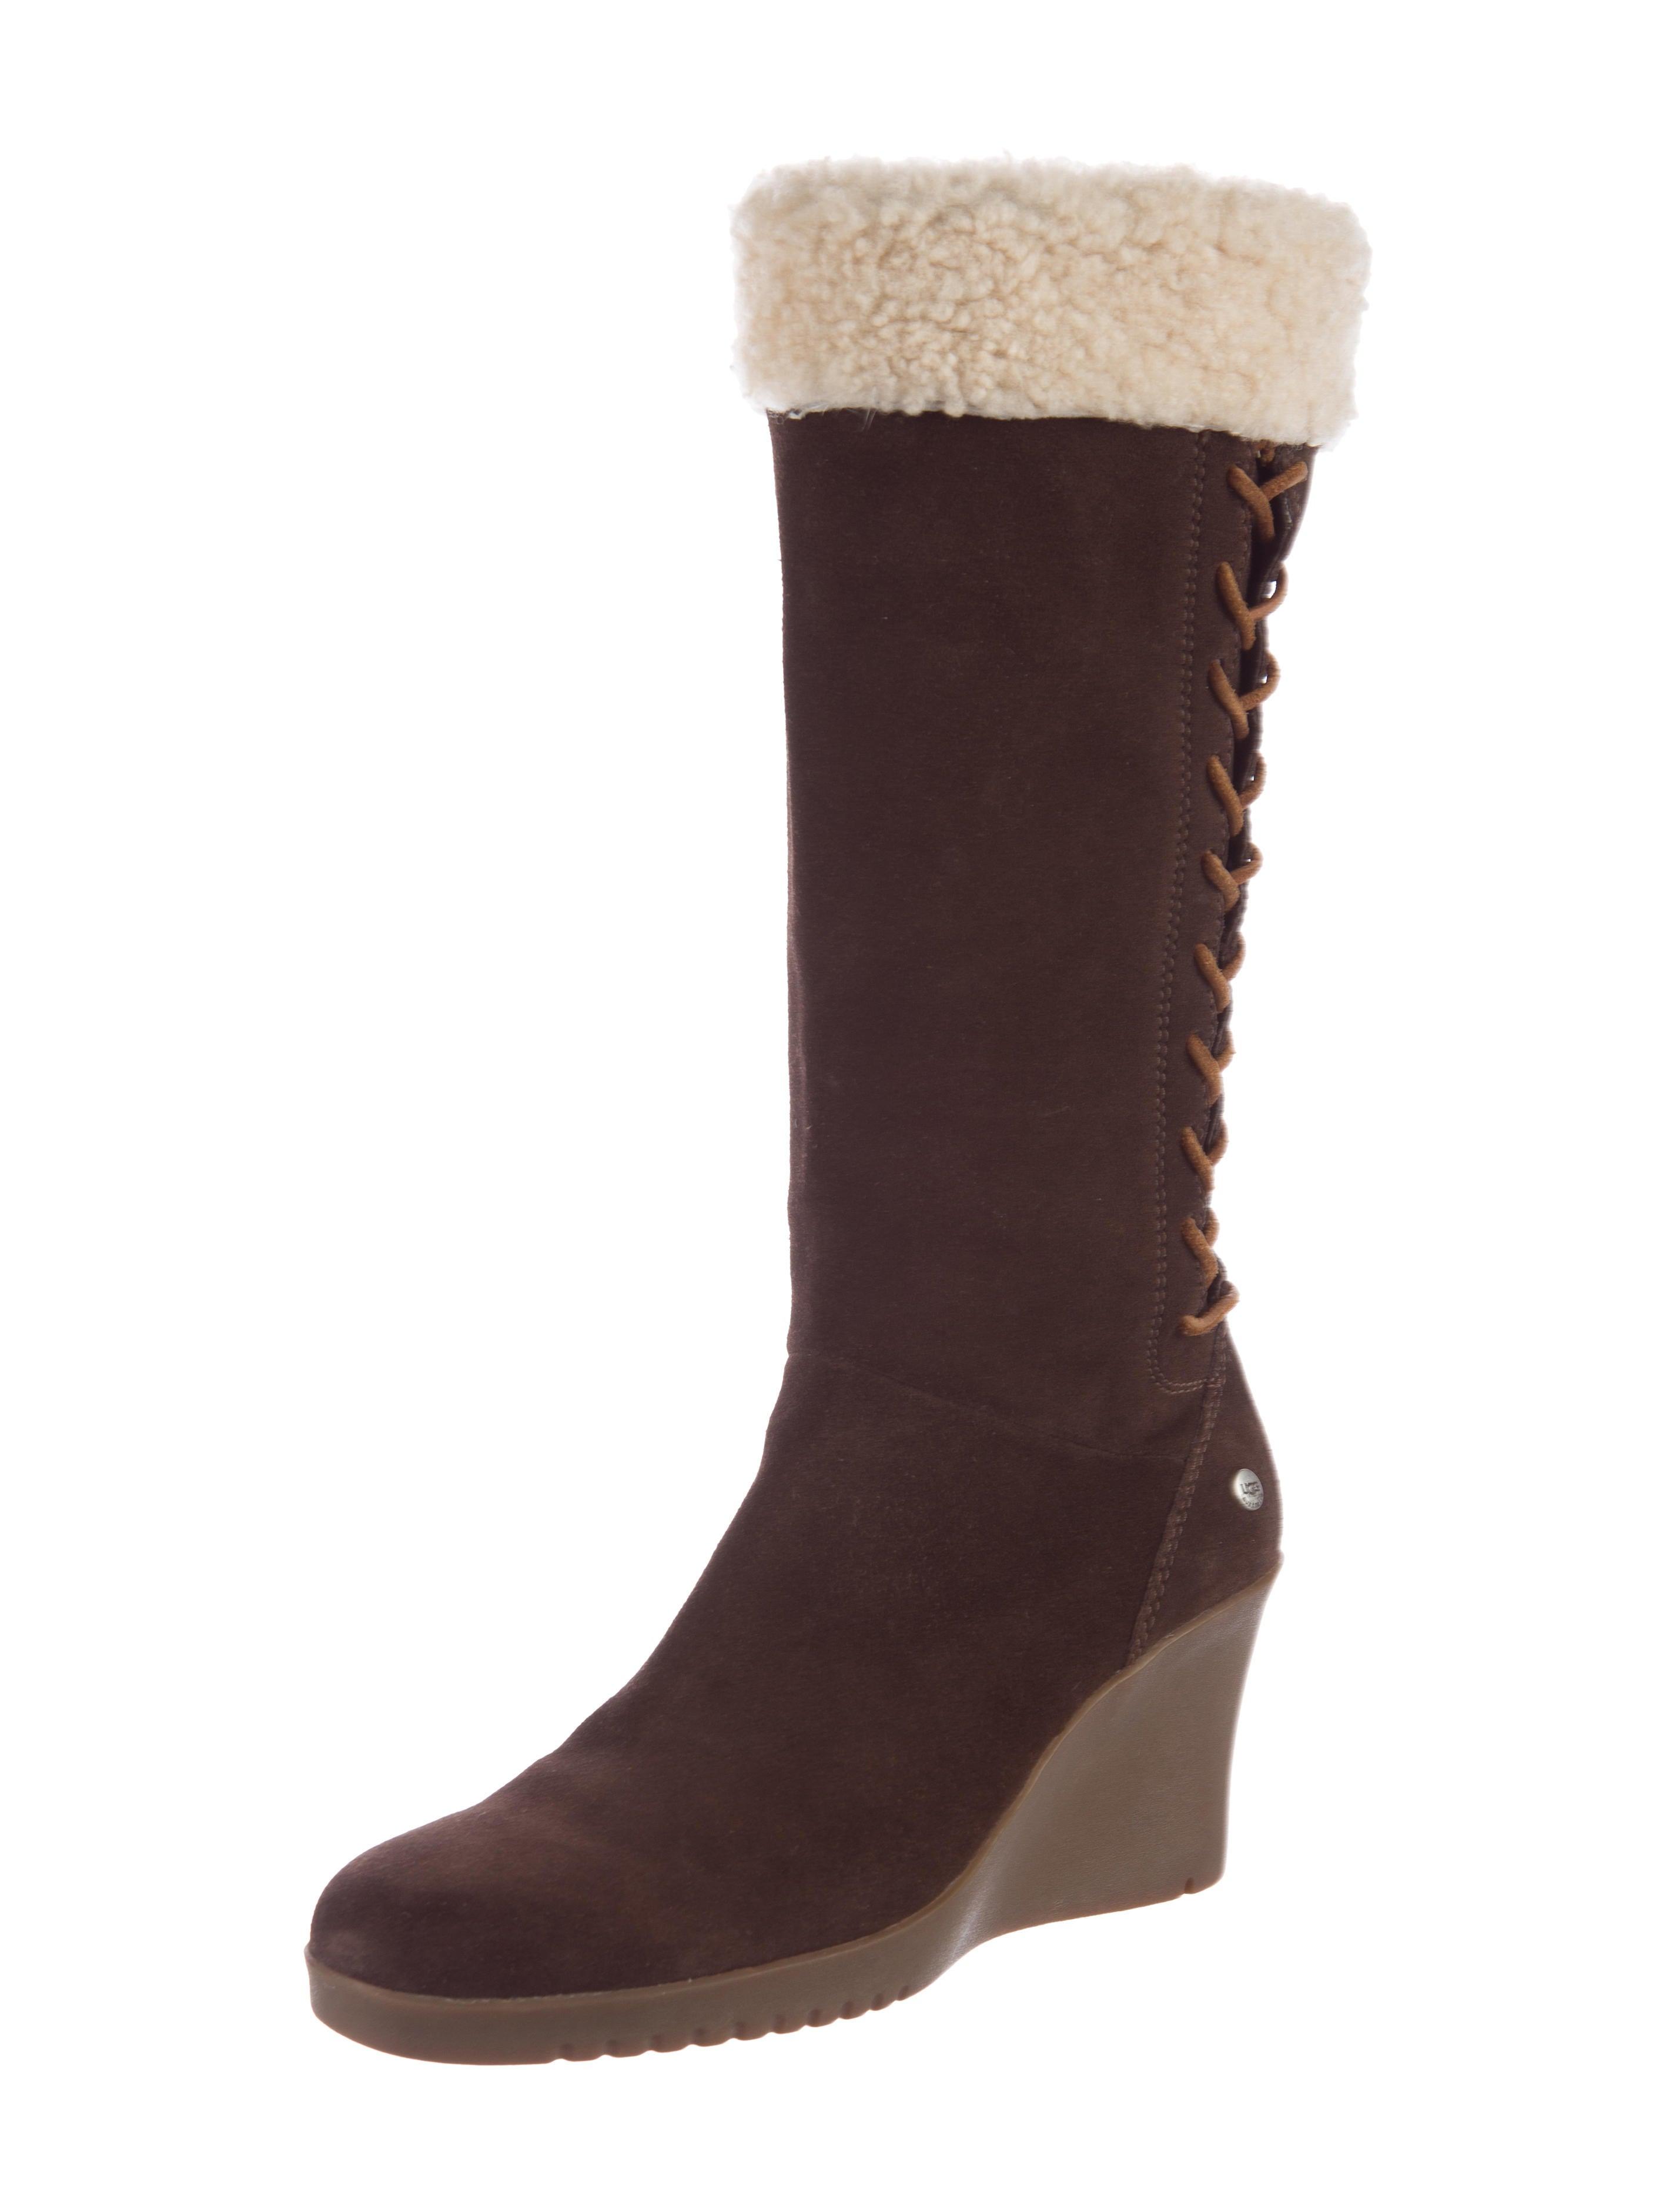 ugg australia shearling wedge boots shoes wuugg20946